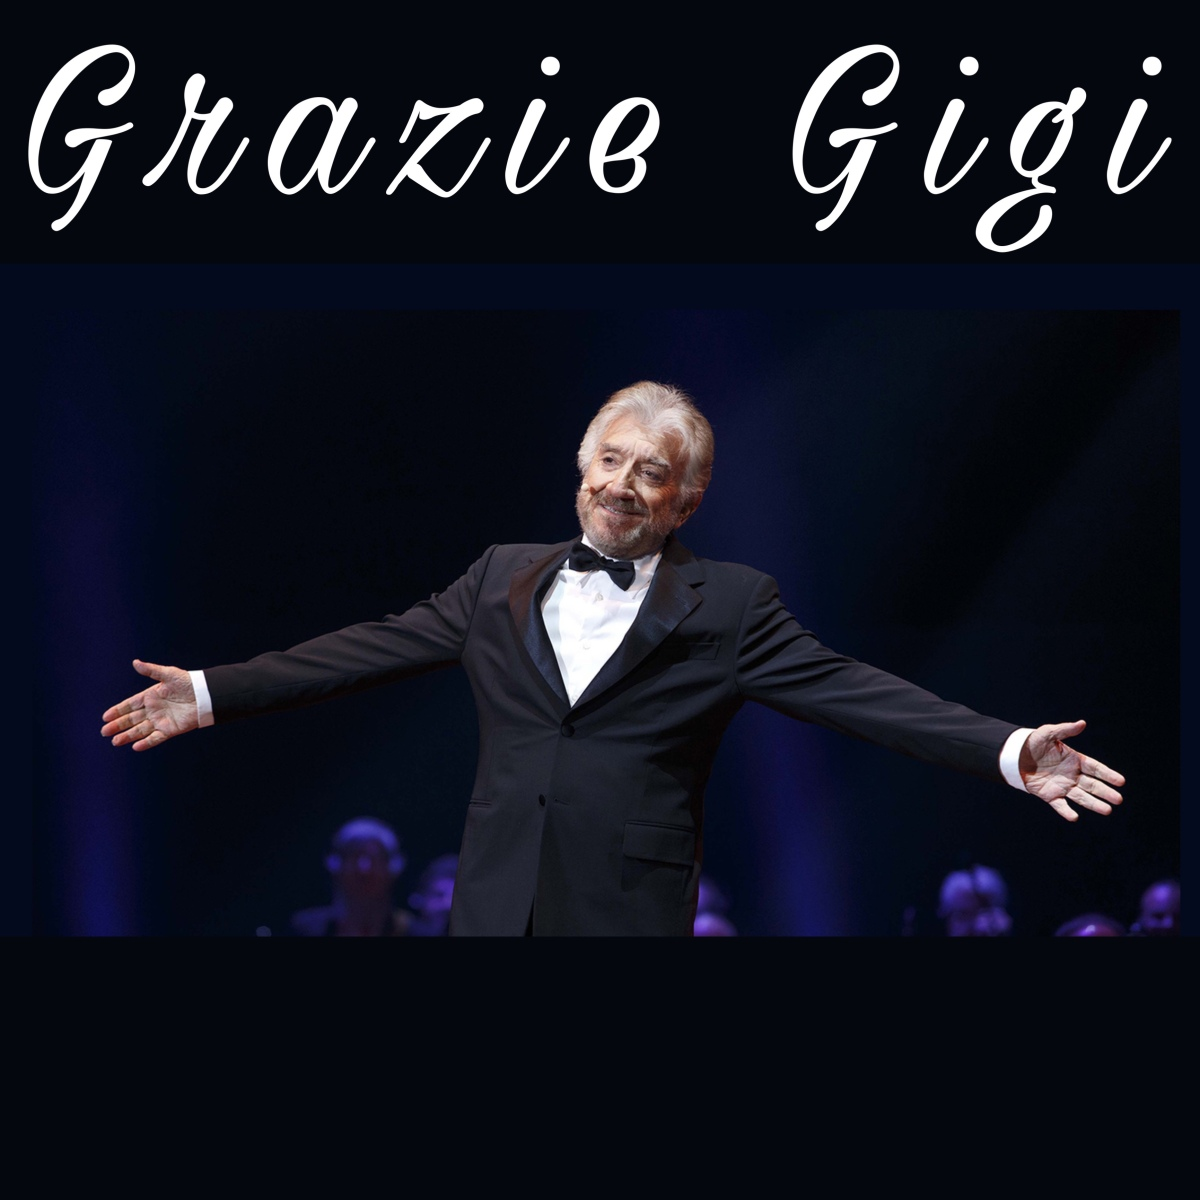 Grazie Gigi